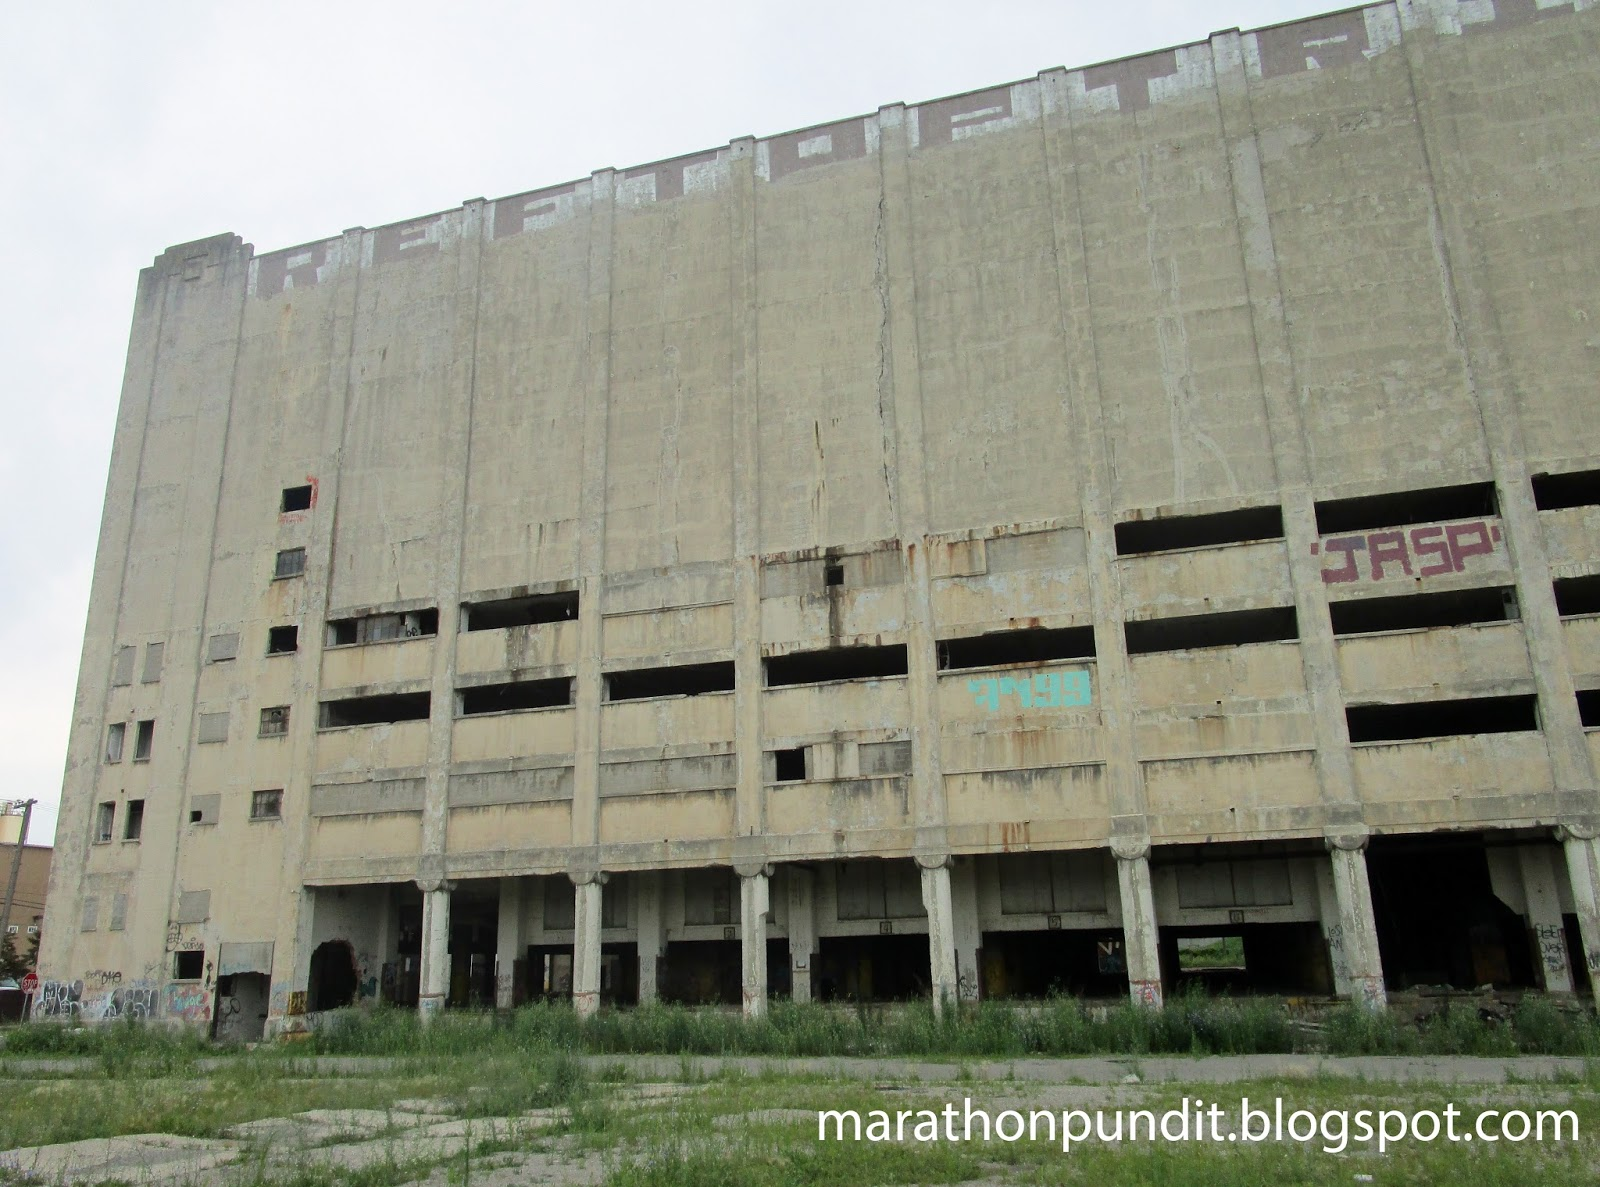 (Photos) Detroitu0027s abandoned Grand Trunk Warehouse u0026 Cold Storage & Marathon Pundit: (Photos) Detroitu0027s abandoned Grand Trunk Warehouse ...